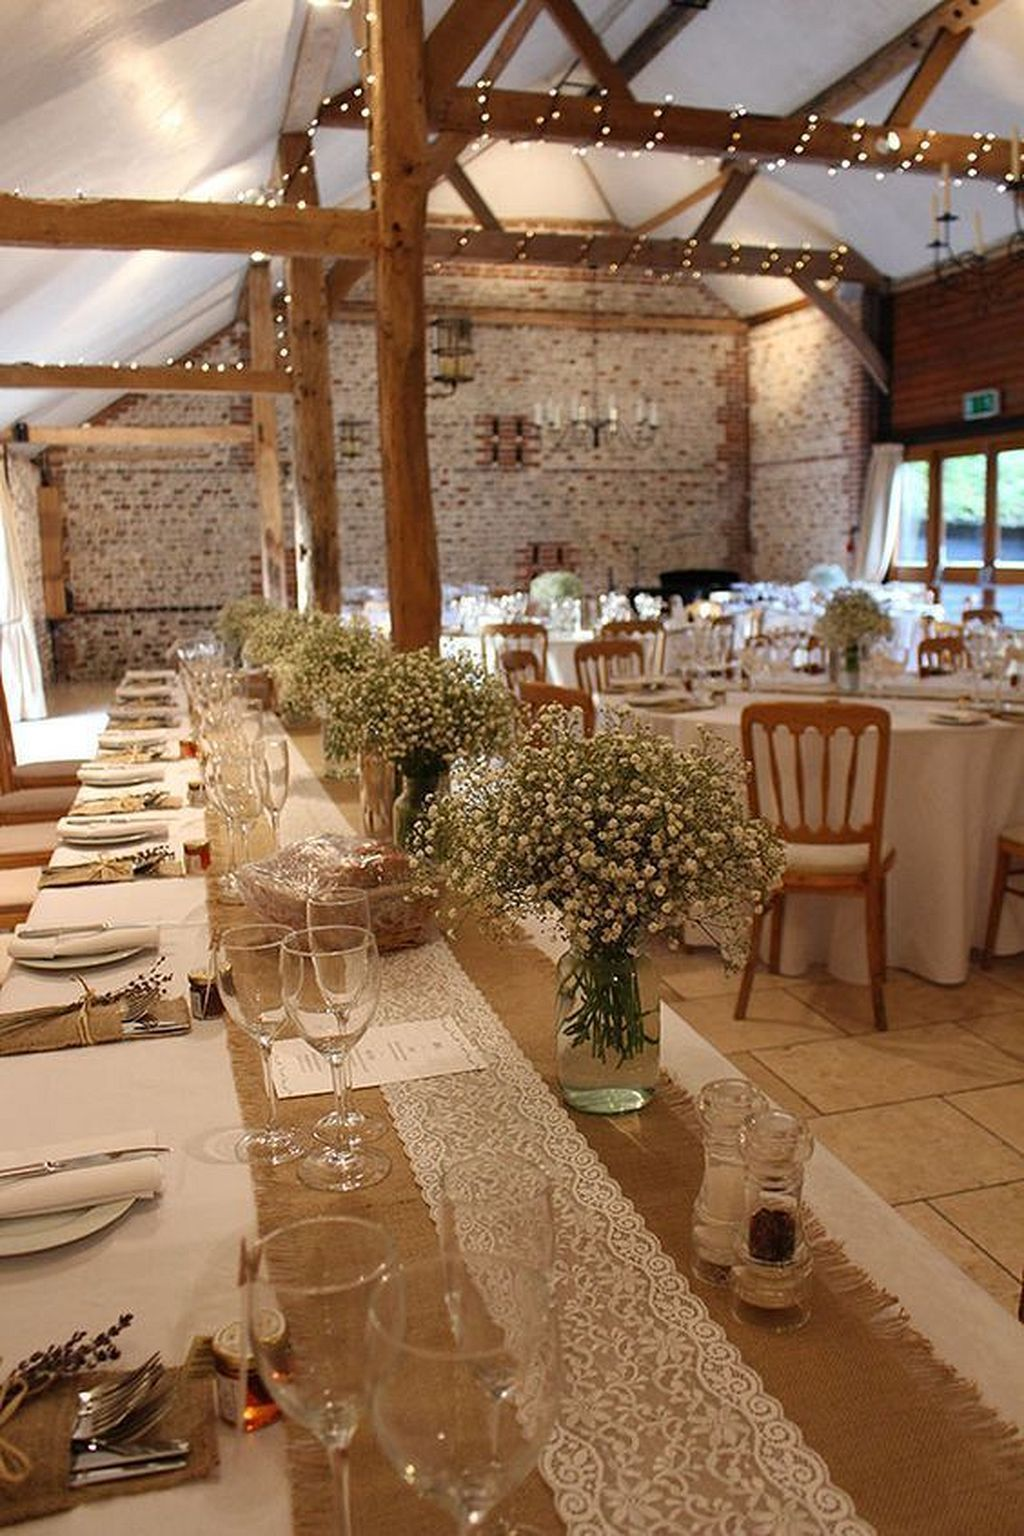 Barn wedding table settings  Burlap Table Decorations For Rustic Wedding WeddingIdeasForKids